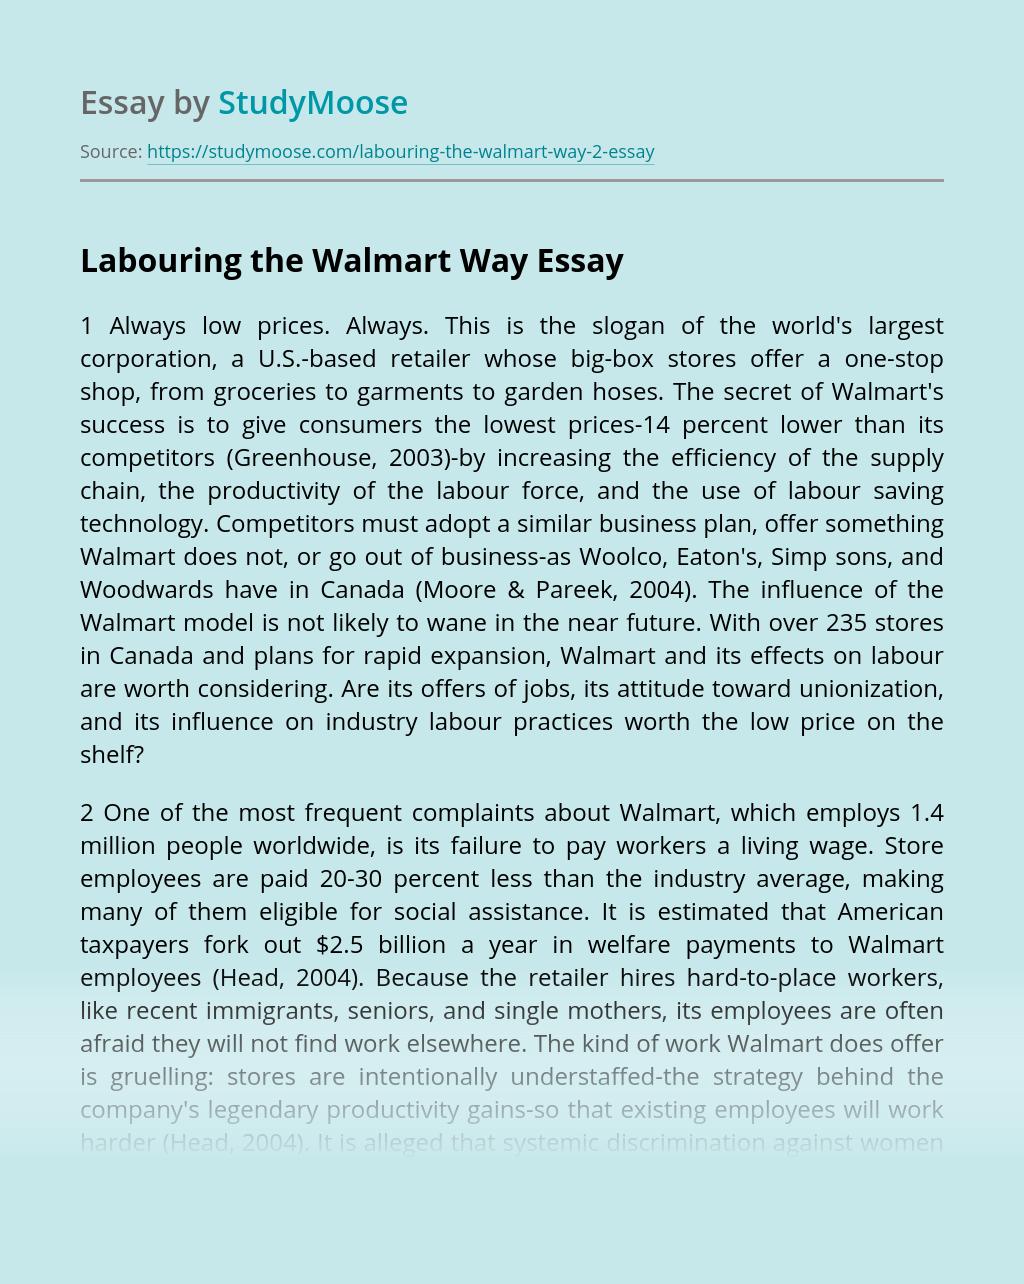 Labouring the Walmart Way